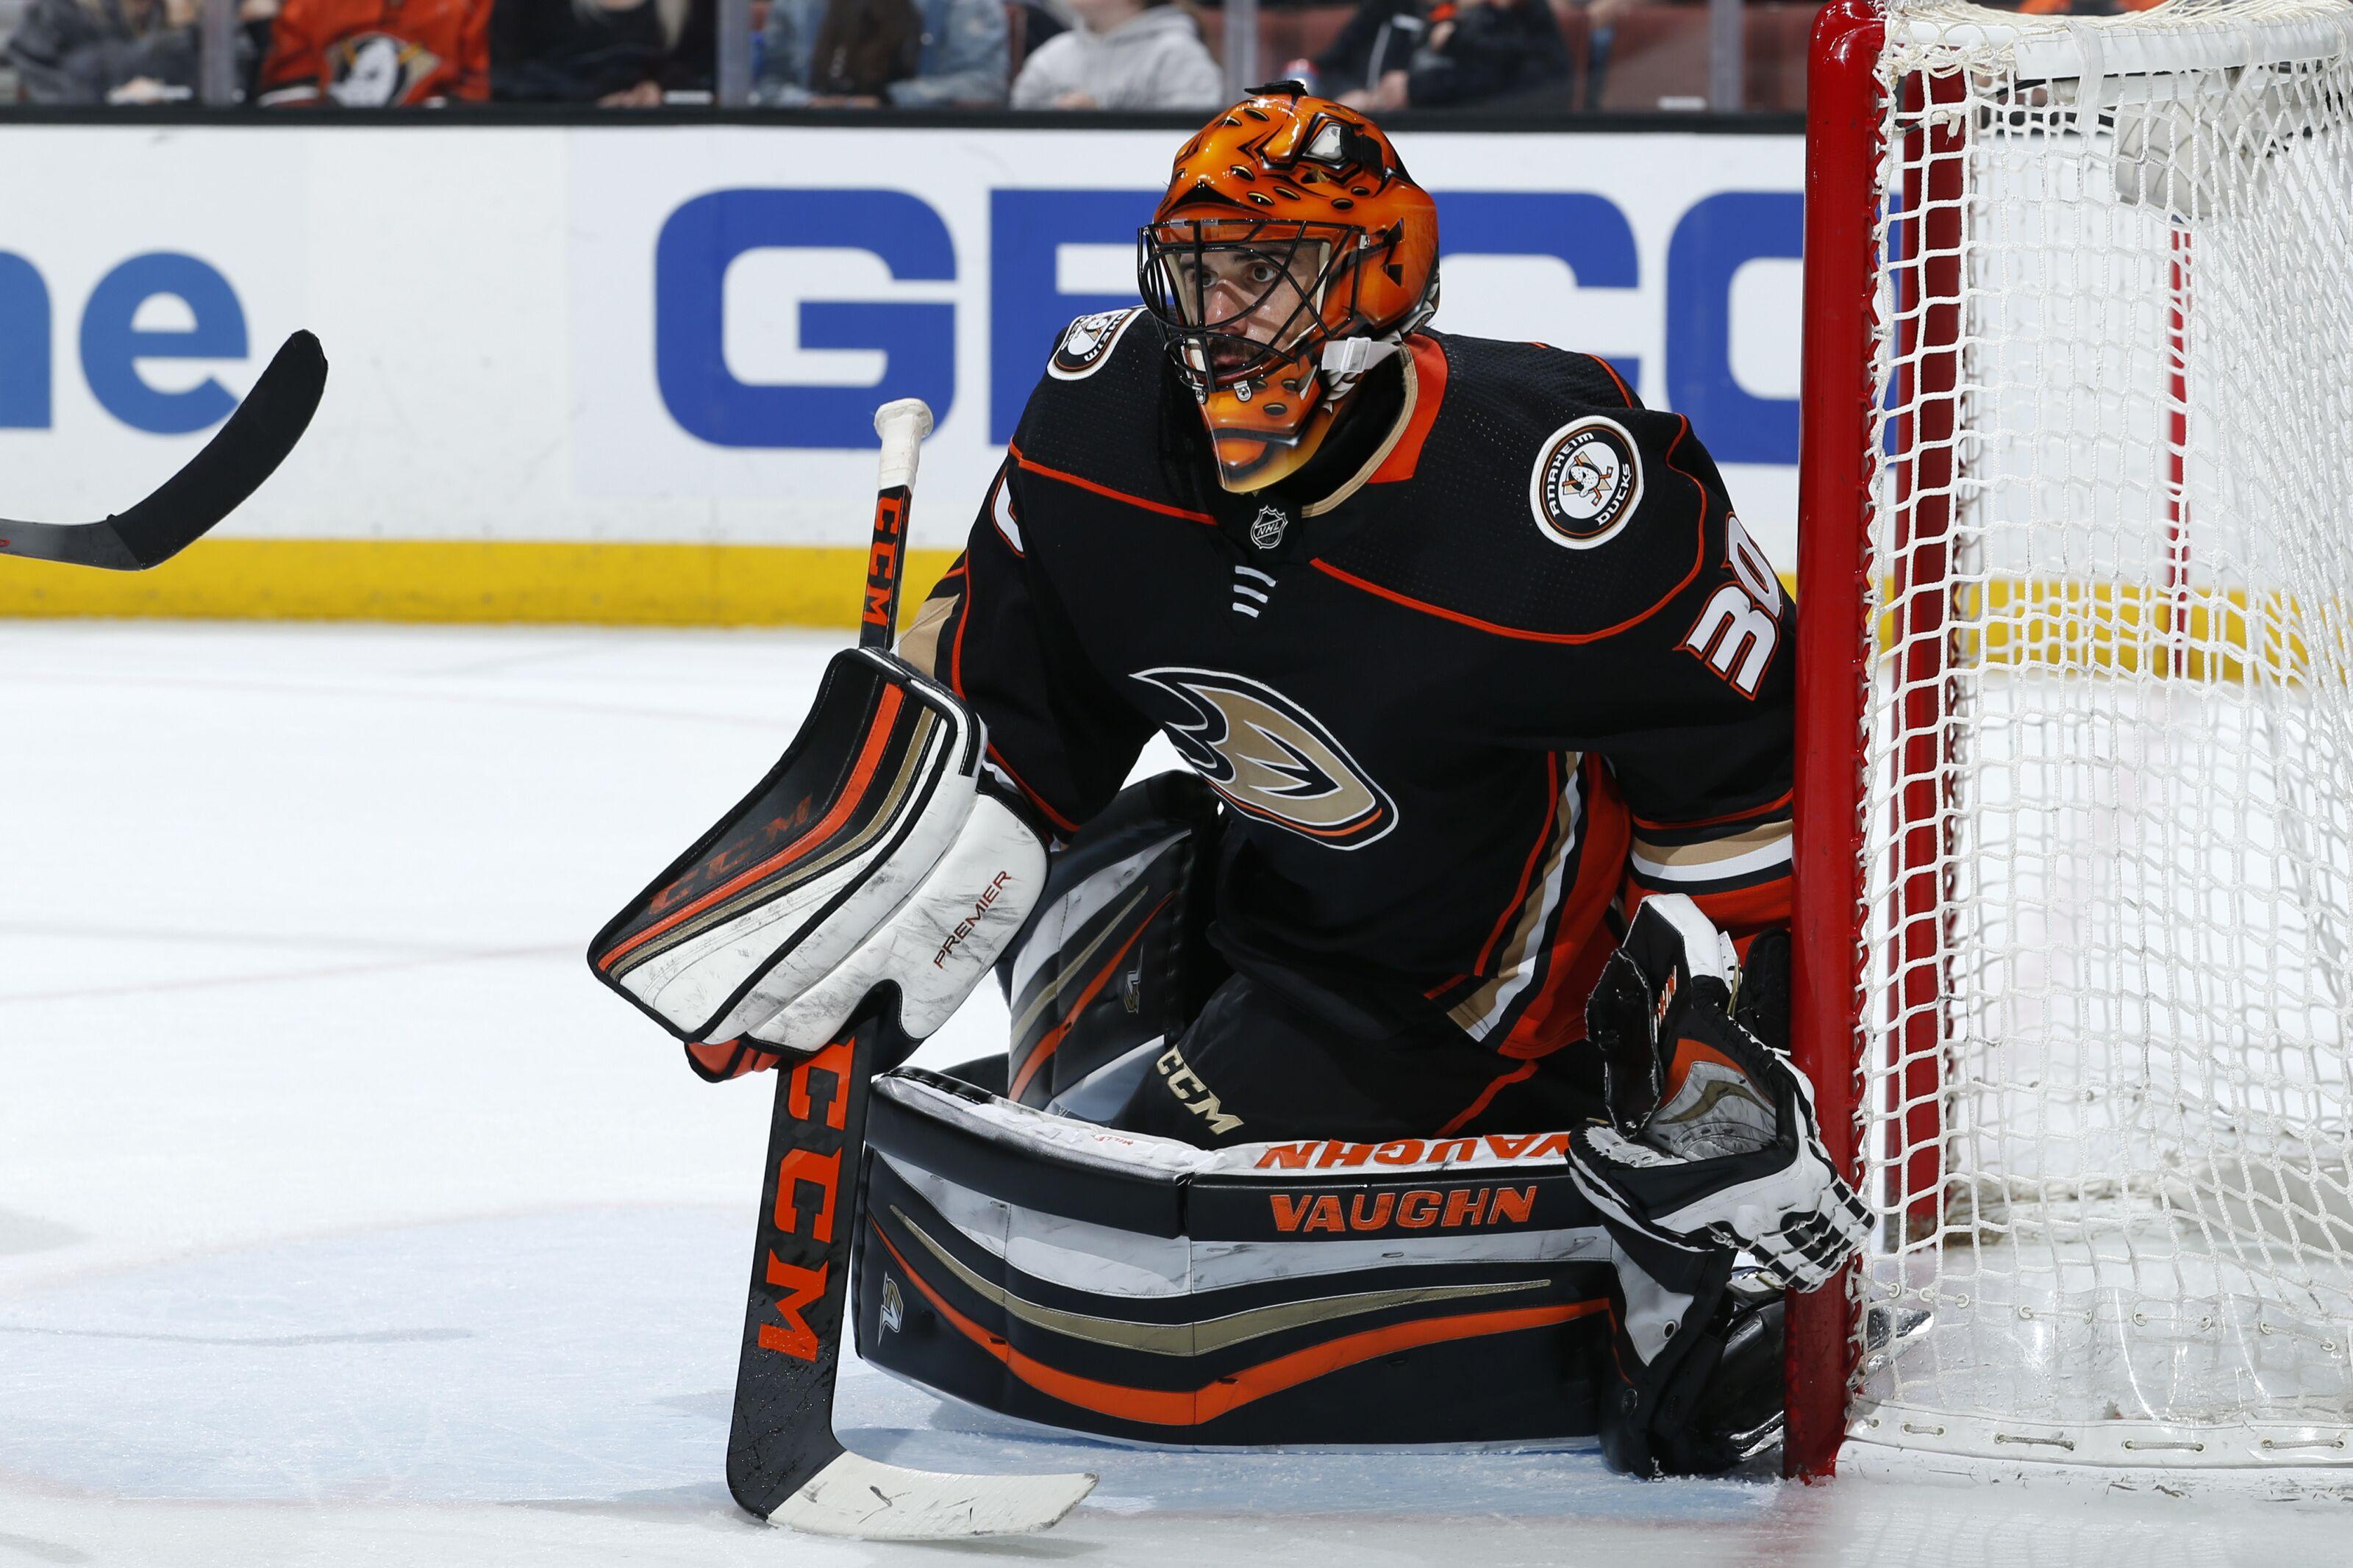 Anaheim Ducks Hockey 201 The Goalie S Butterfly Technique